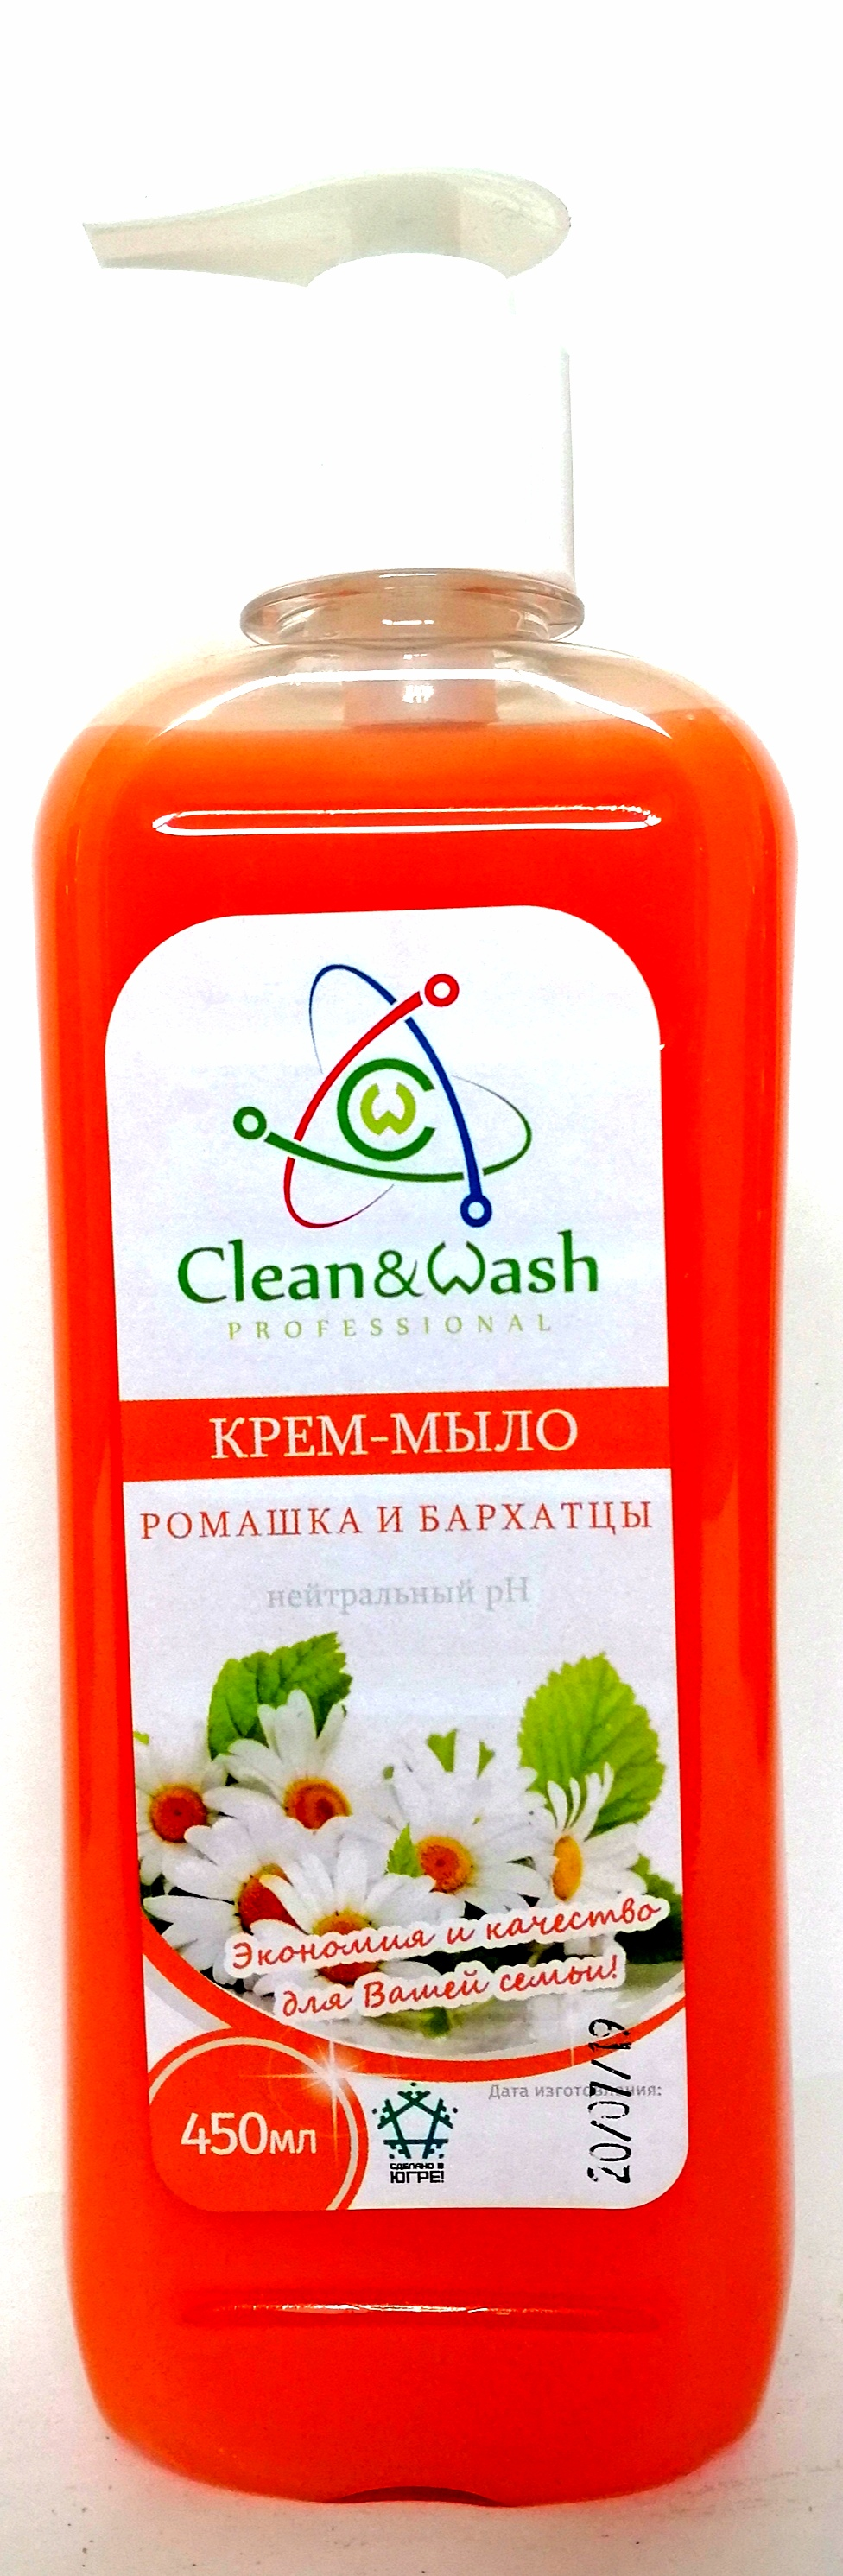 Крем мыло Clean&Wash